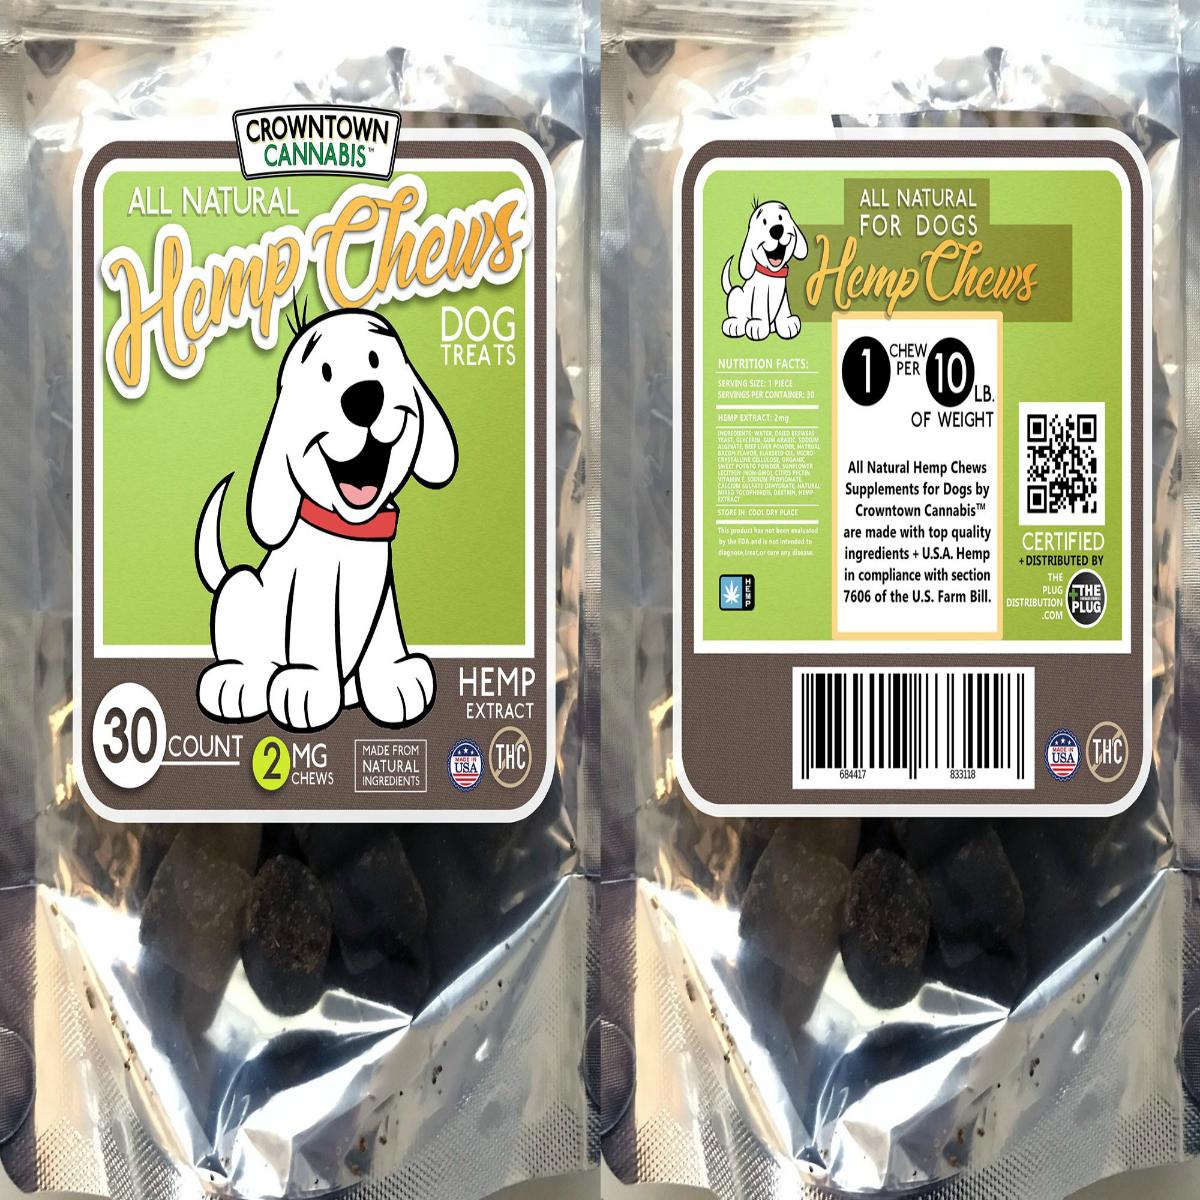 Crowntown Cannabis Pet Chews